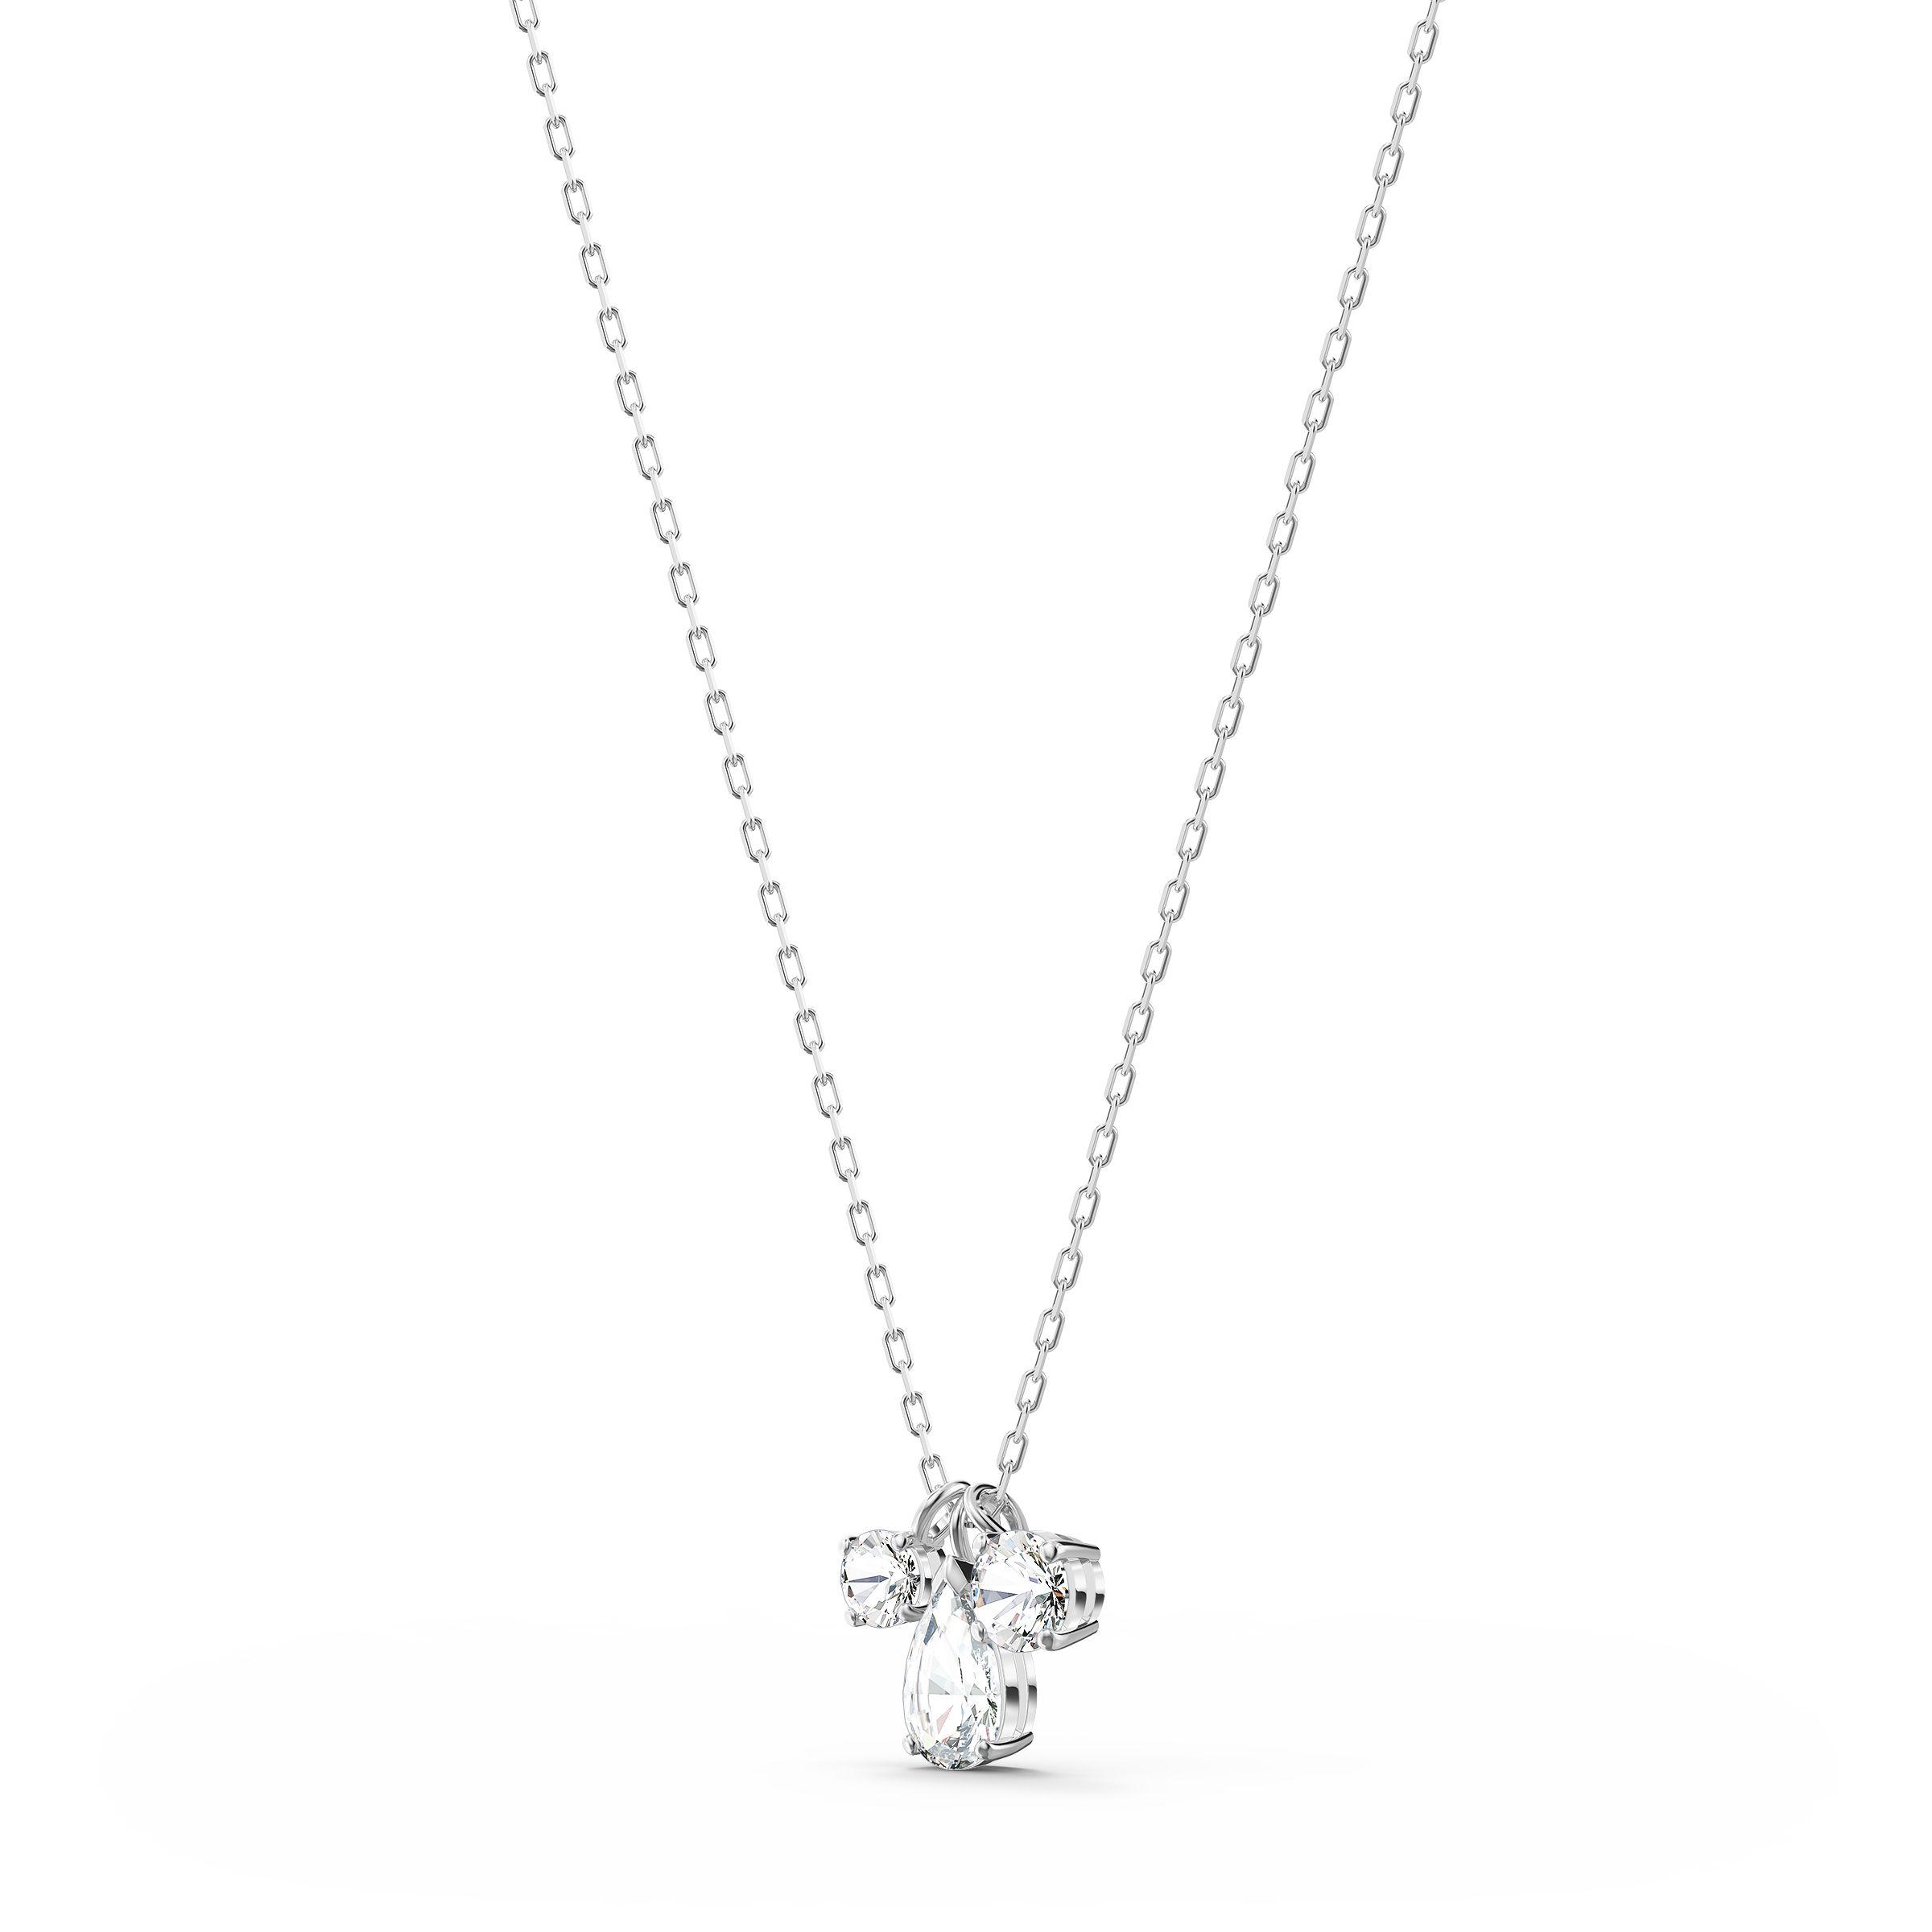 Pendentif Attract Cluster, blanc, métal rhodié, Swarovski